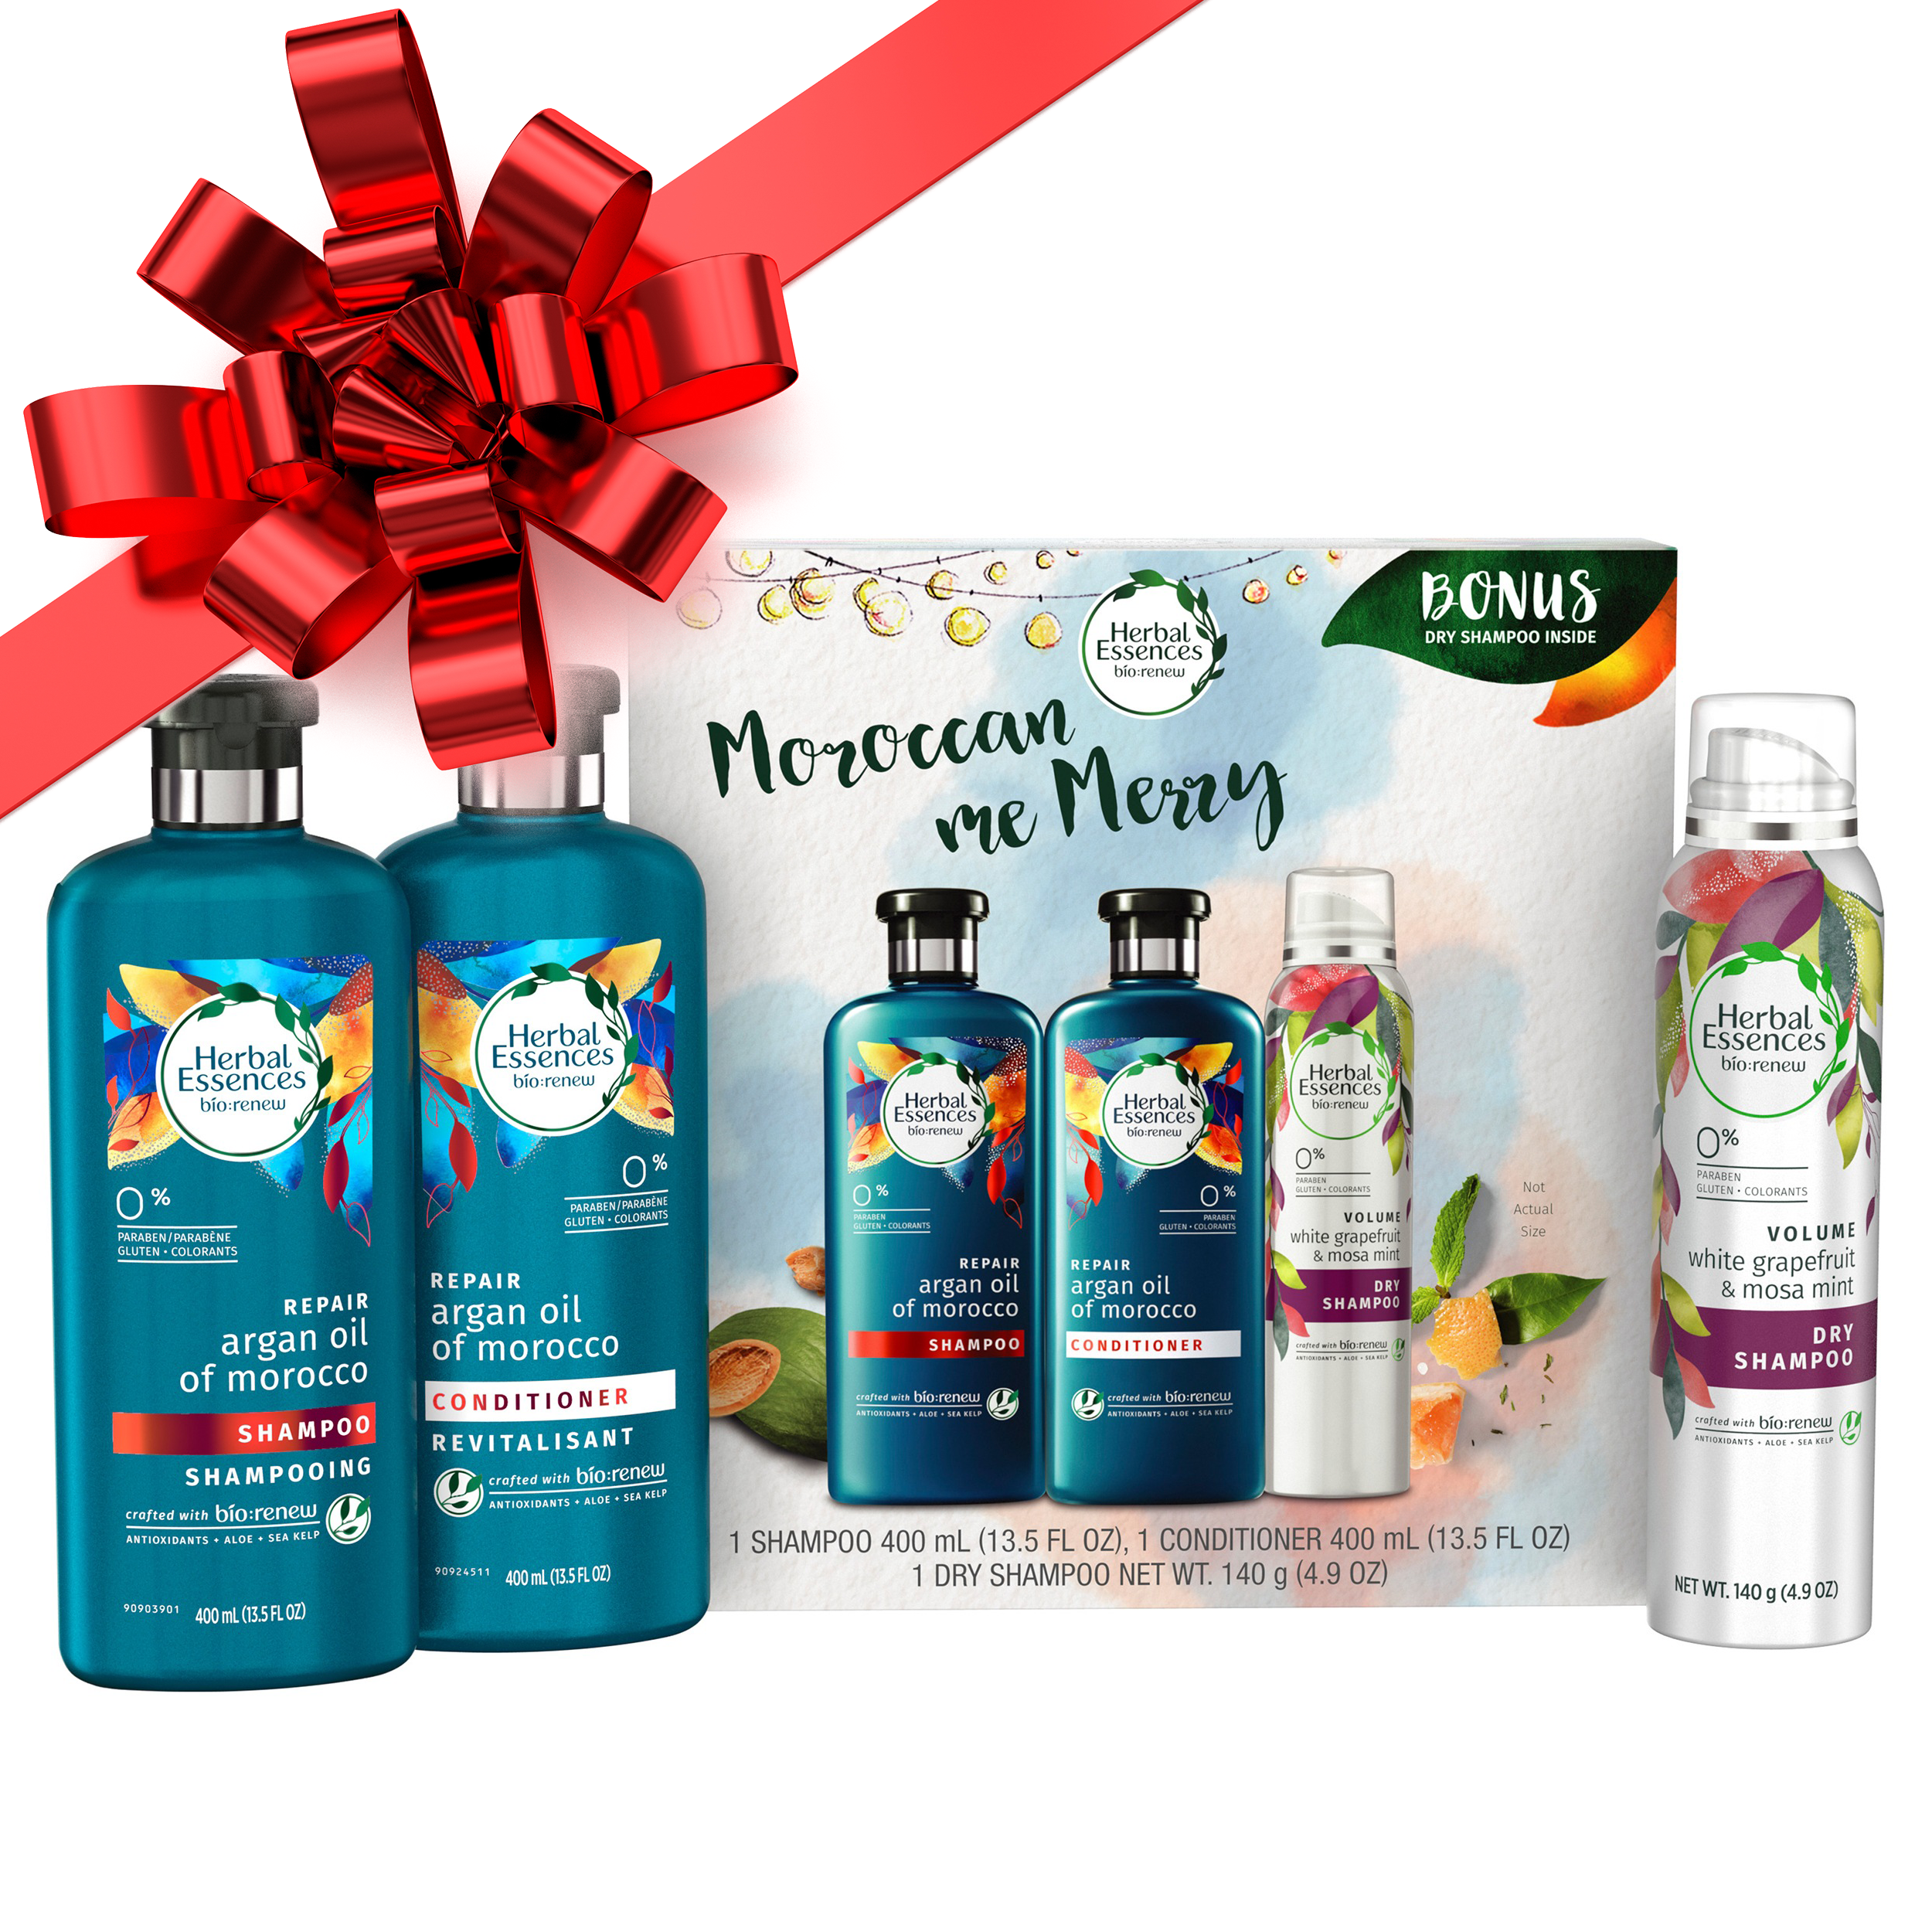 Herbal Essences® Bio:renew Argan Oil of Morocco Shampoo and Conditioner + White Grapefruit Dry Shampoo Holiday Pack